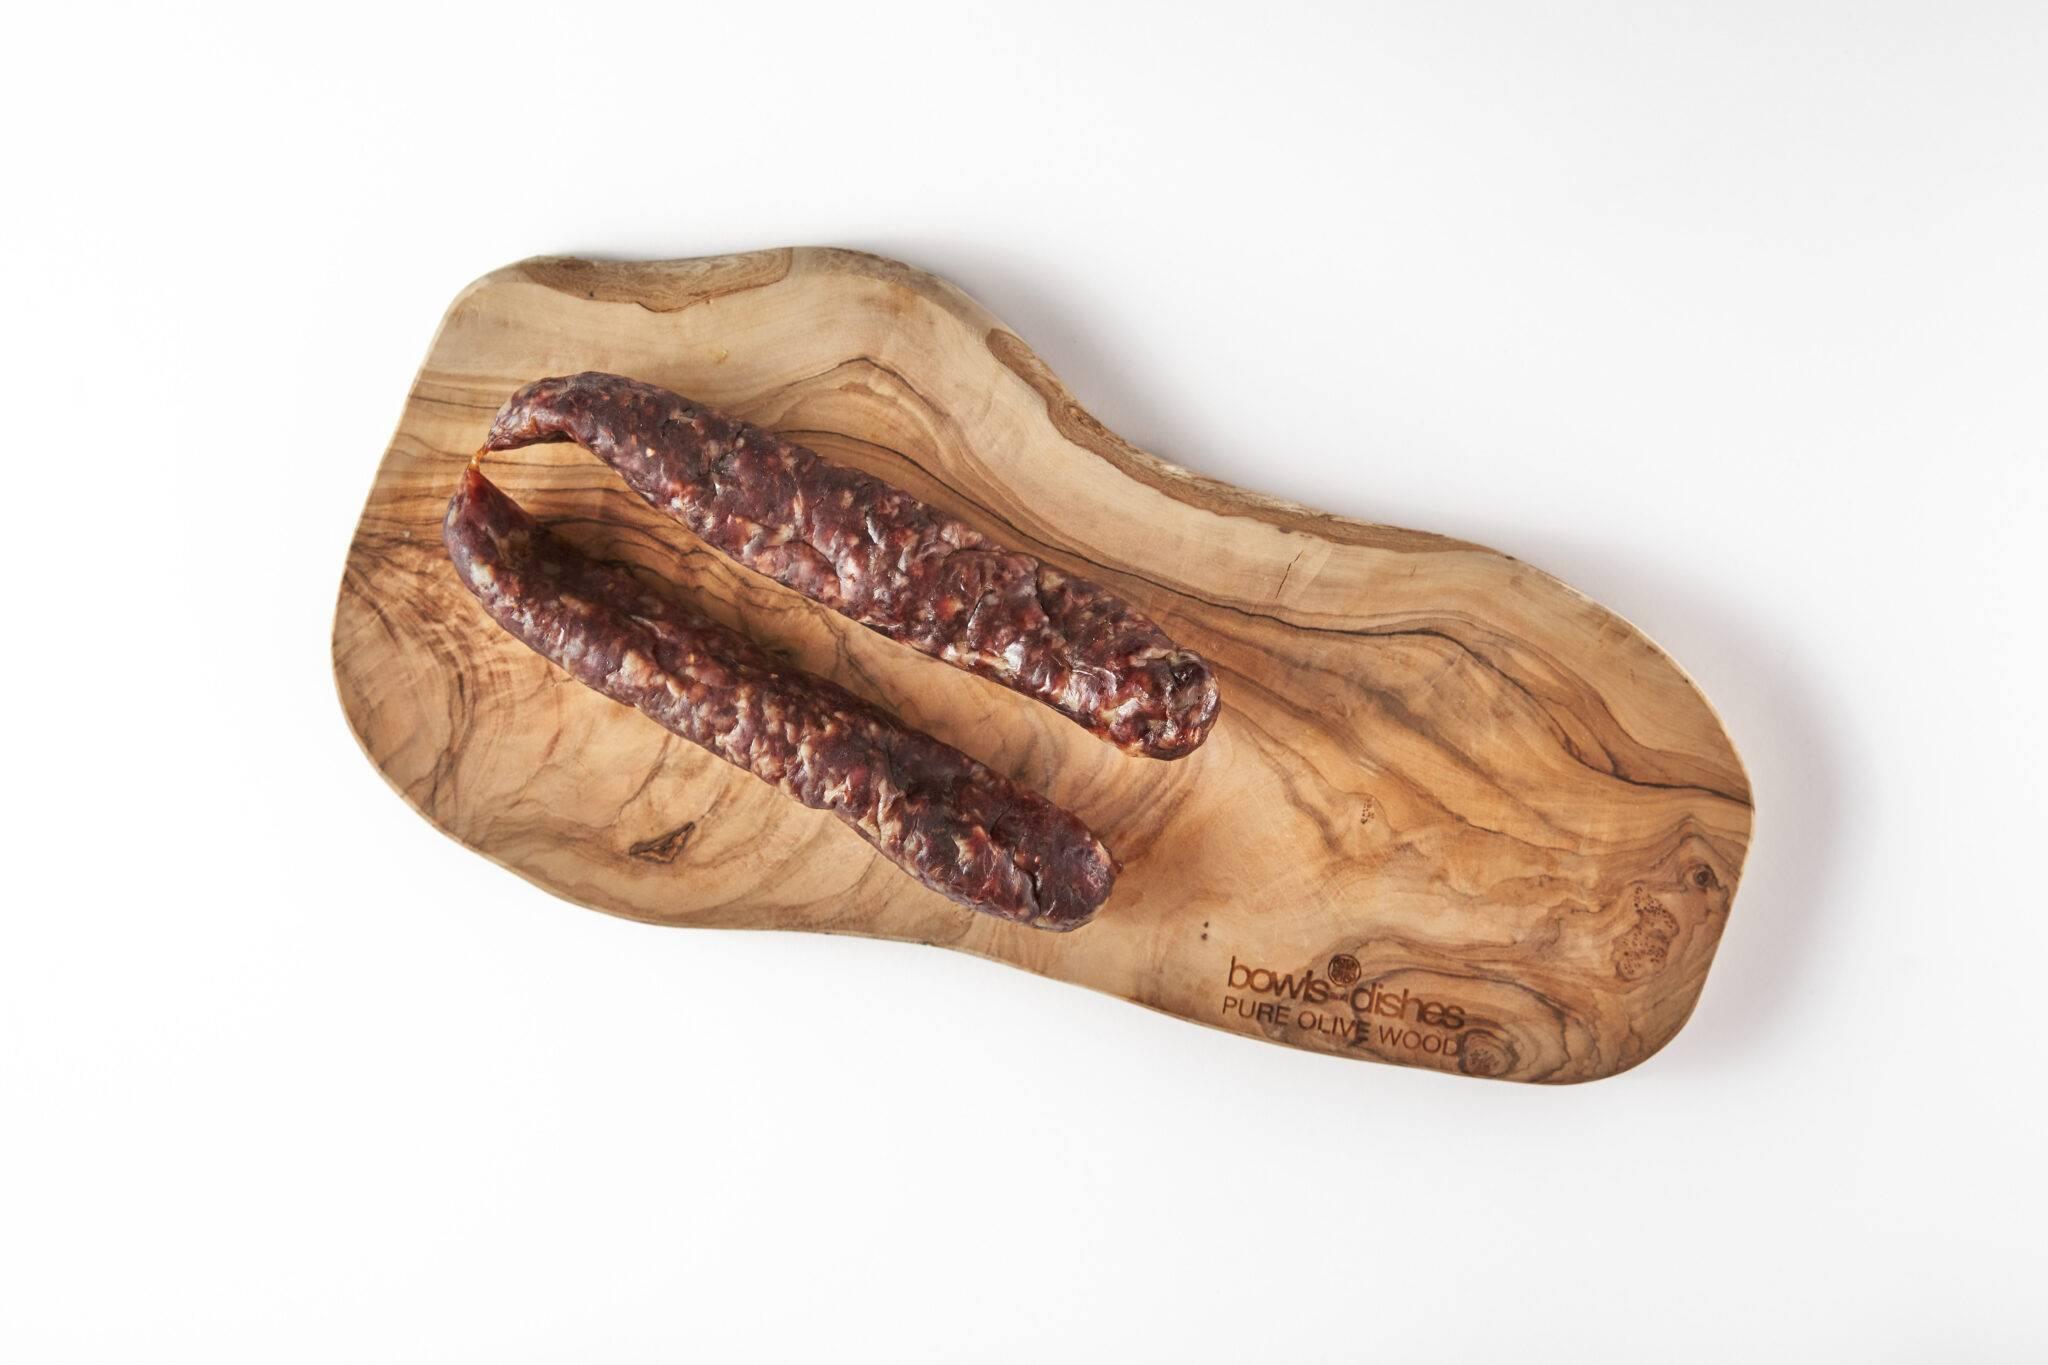 Vleesch & Co Droge worst knoflook